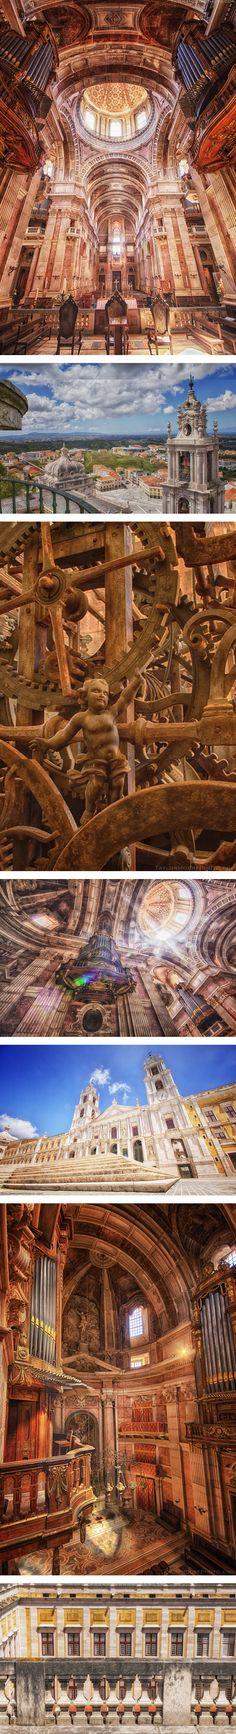 Palacio Mafra Basilica